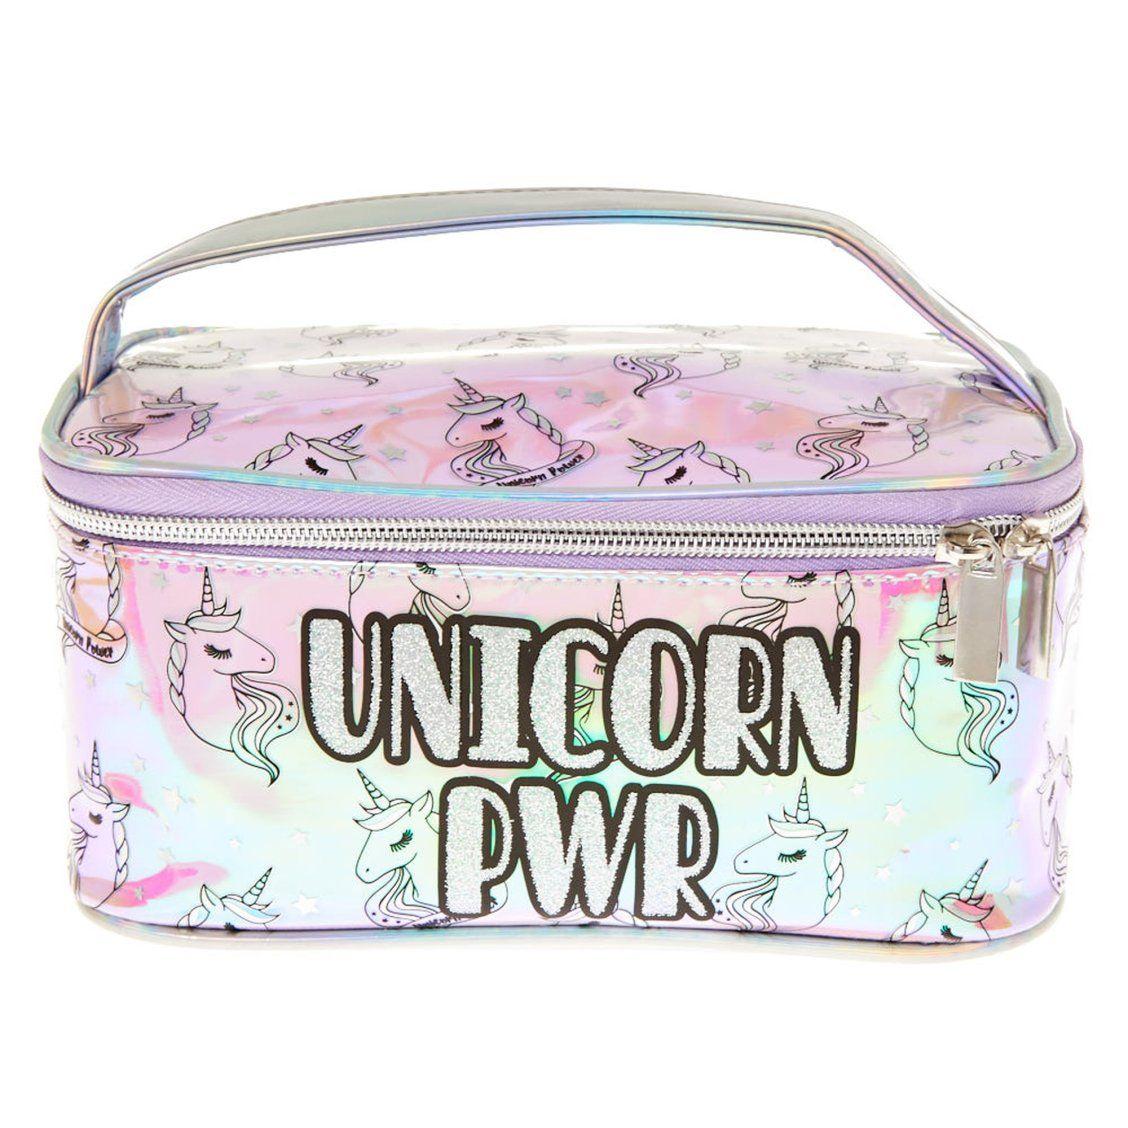 UNICORN PWR Holographic Cosmetics Bag with Handle Keep